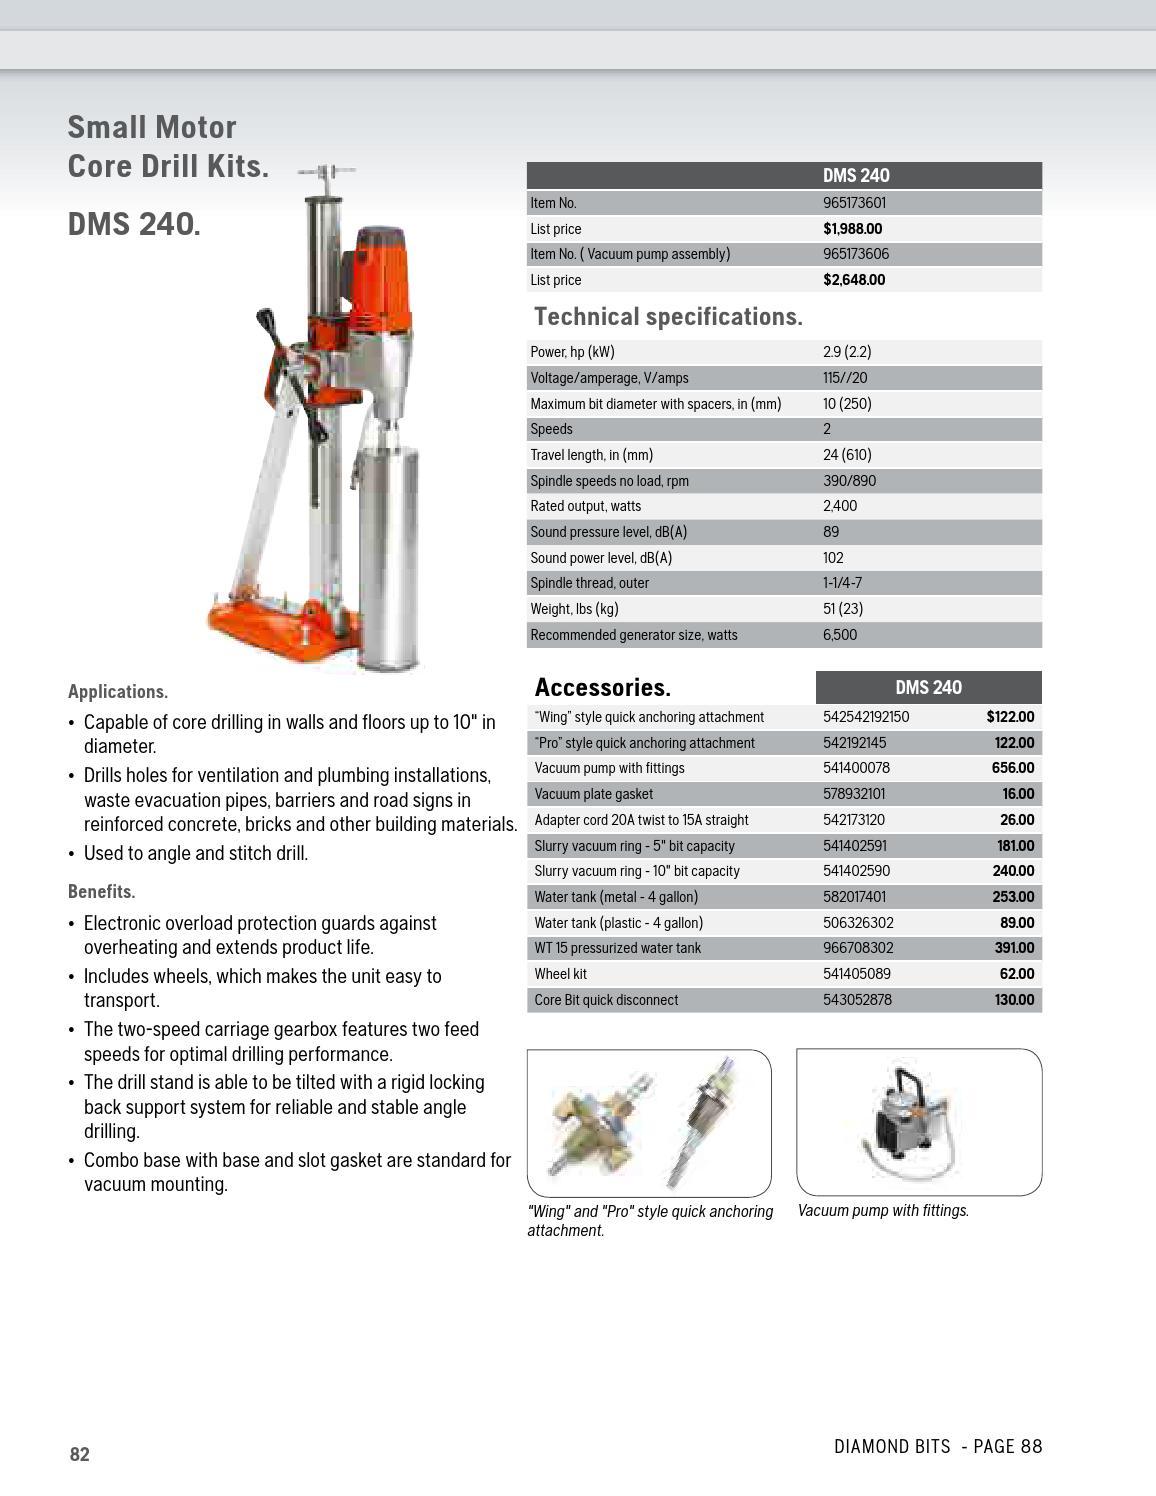 HUSQVARNA 541402591 Slurry Vacuum Ring